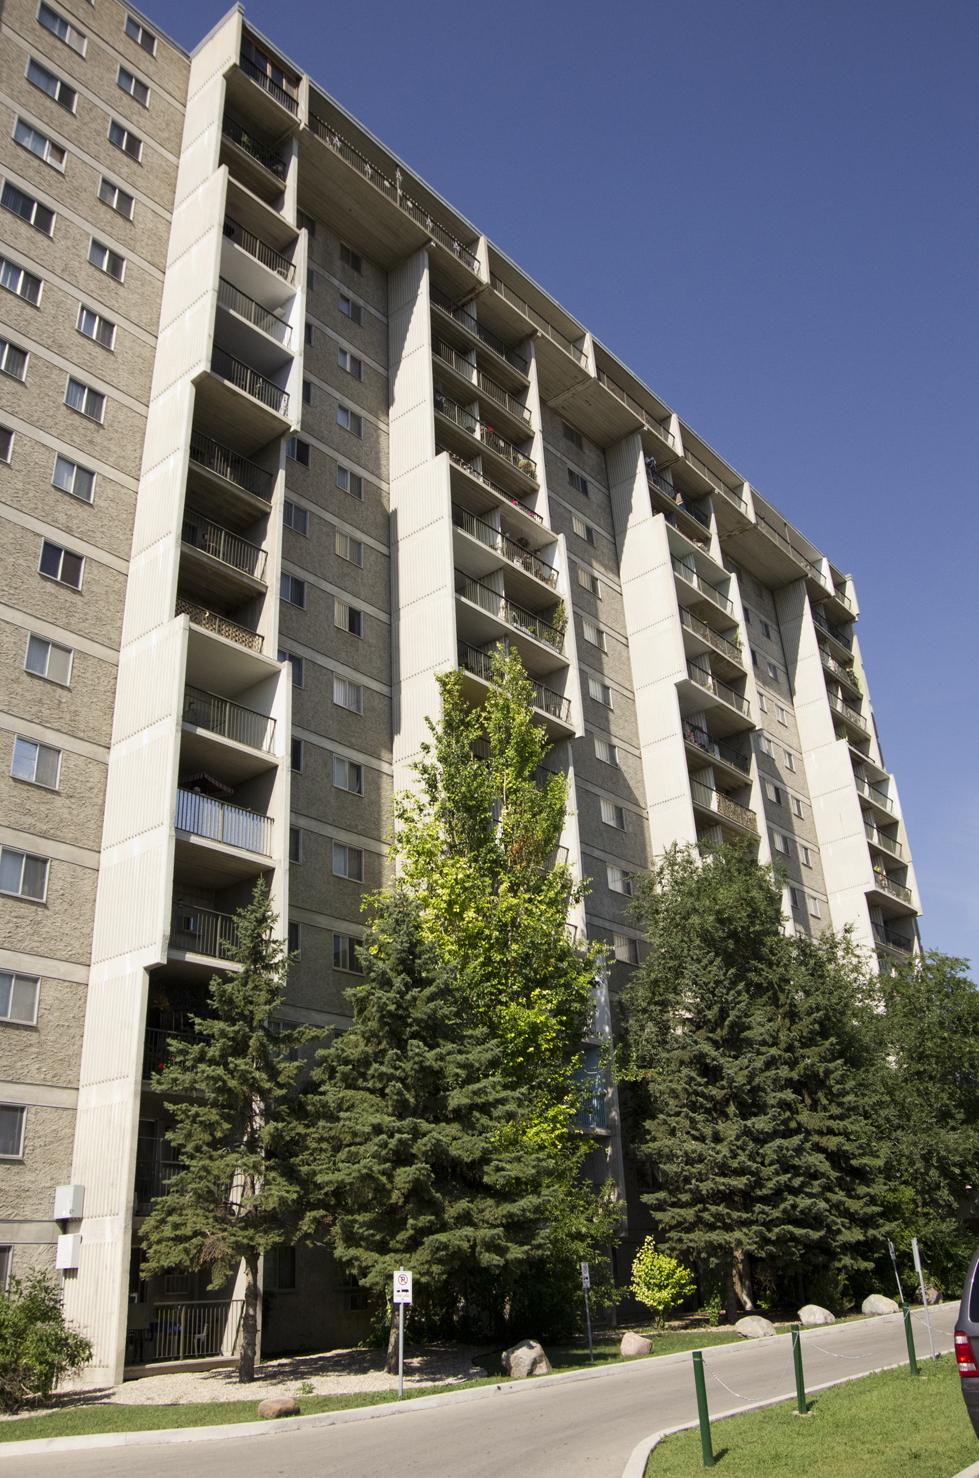 77 University Crescent - Winnipeg Architecture Foundation